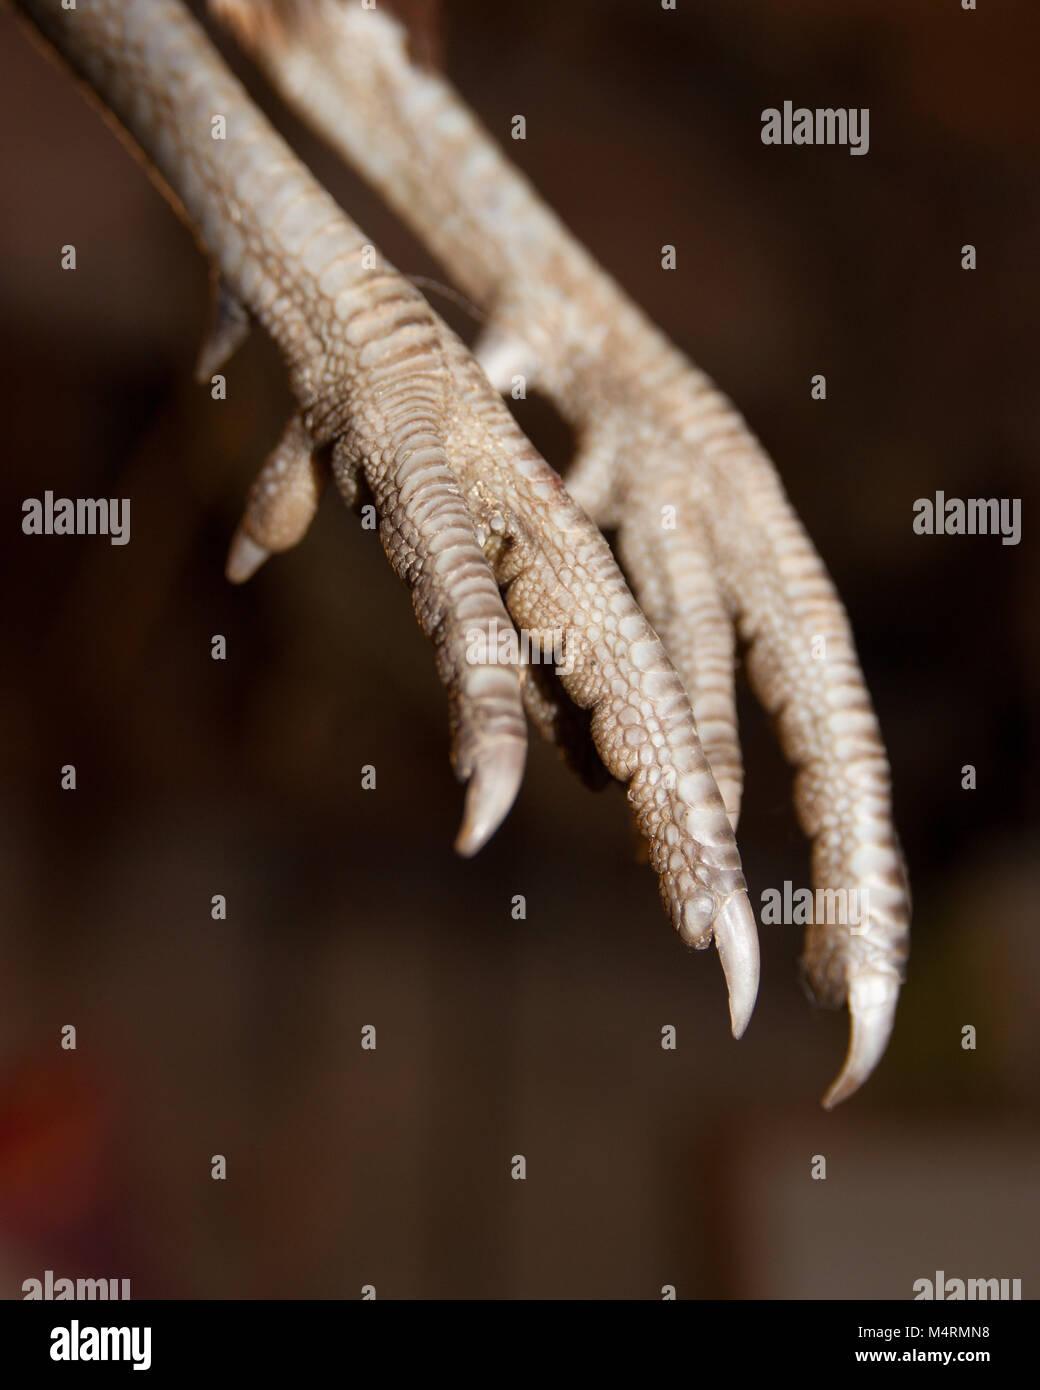 Scaly dinosaur like bird pheasant legs and feet - Stock Image